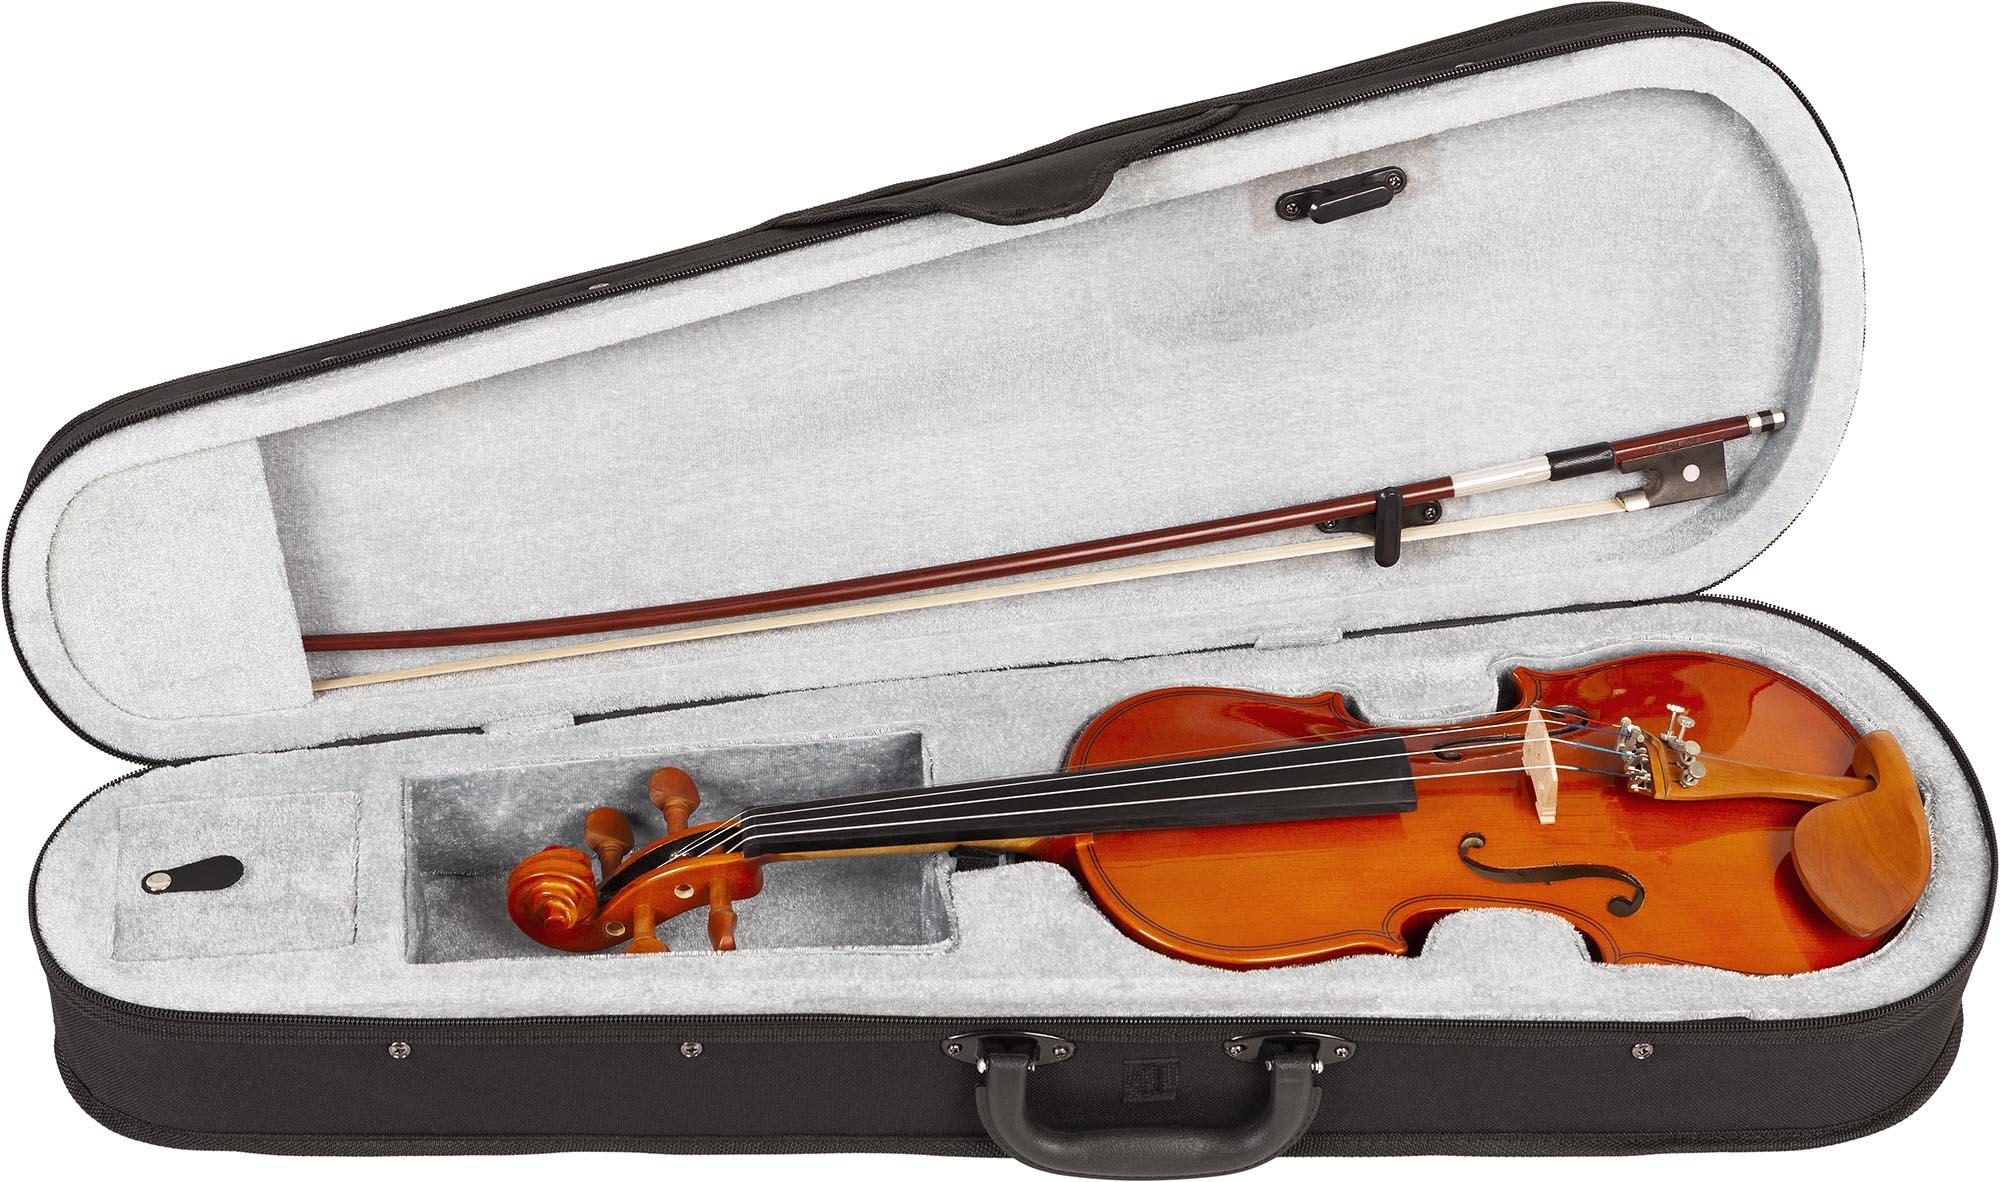 hve241 violino hofma hve241 estojo aberto